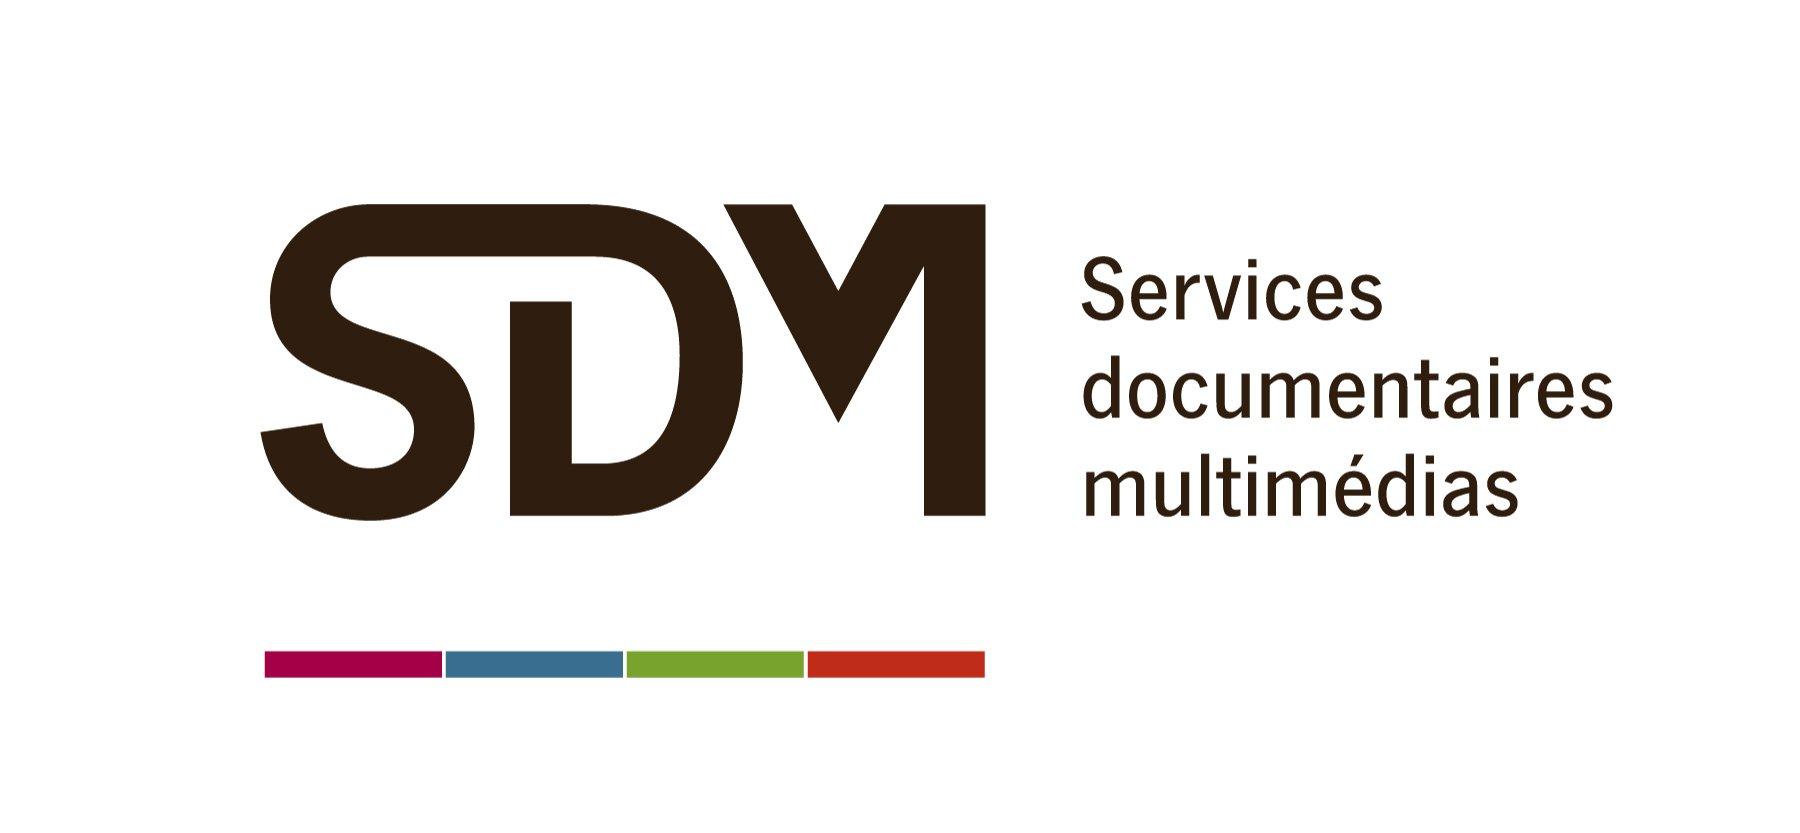 sdm_logotype SDM - Identité